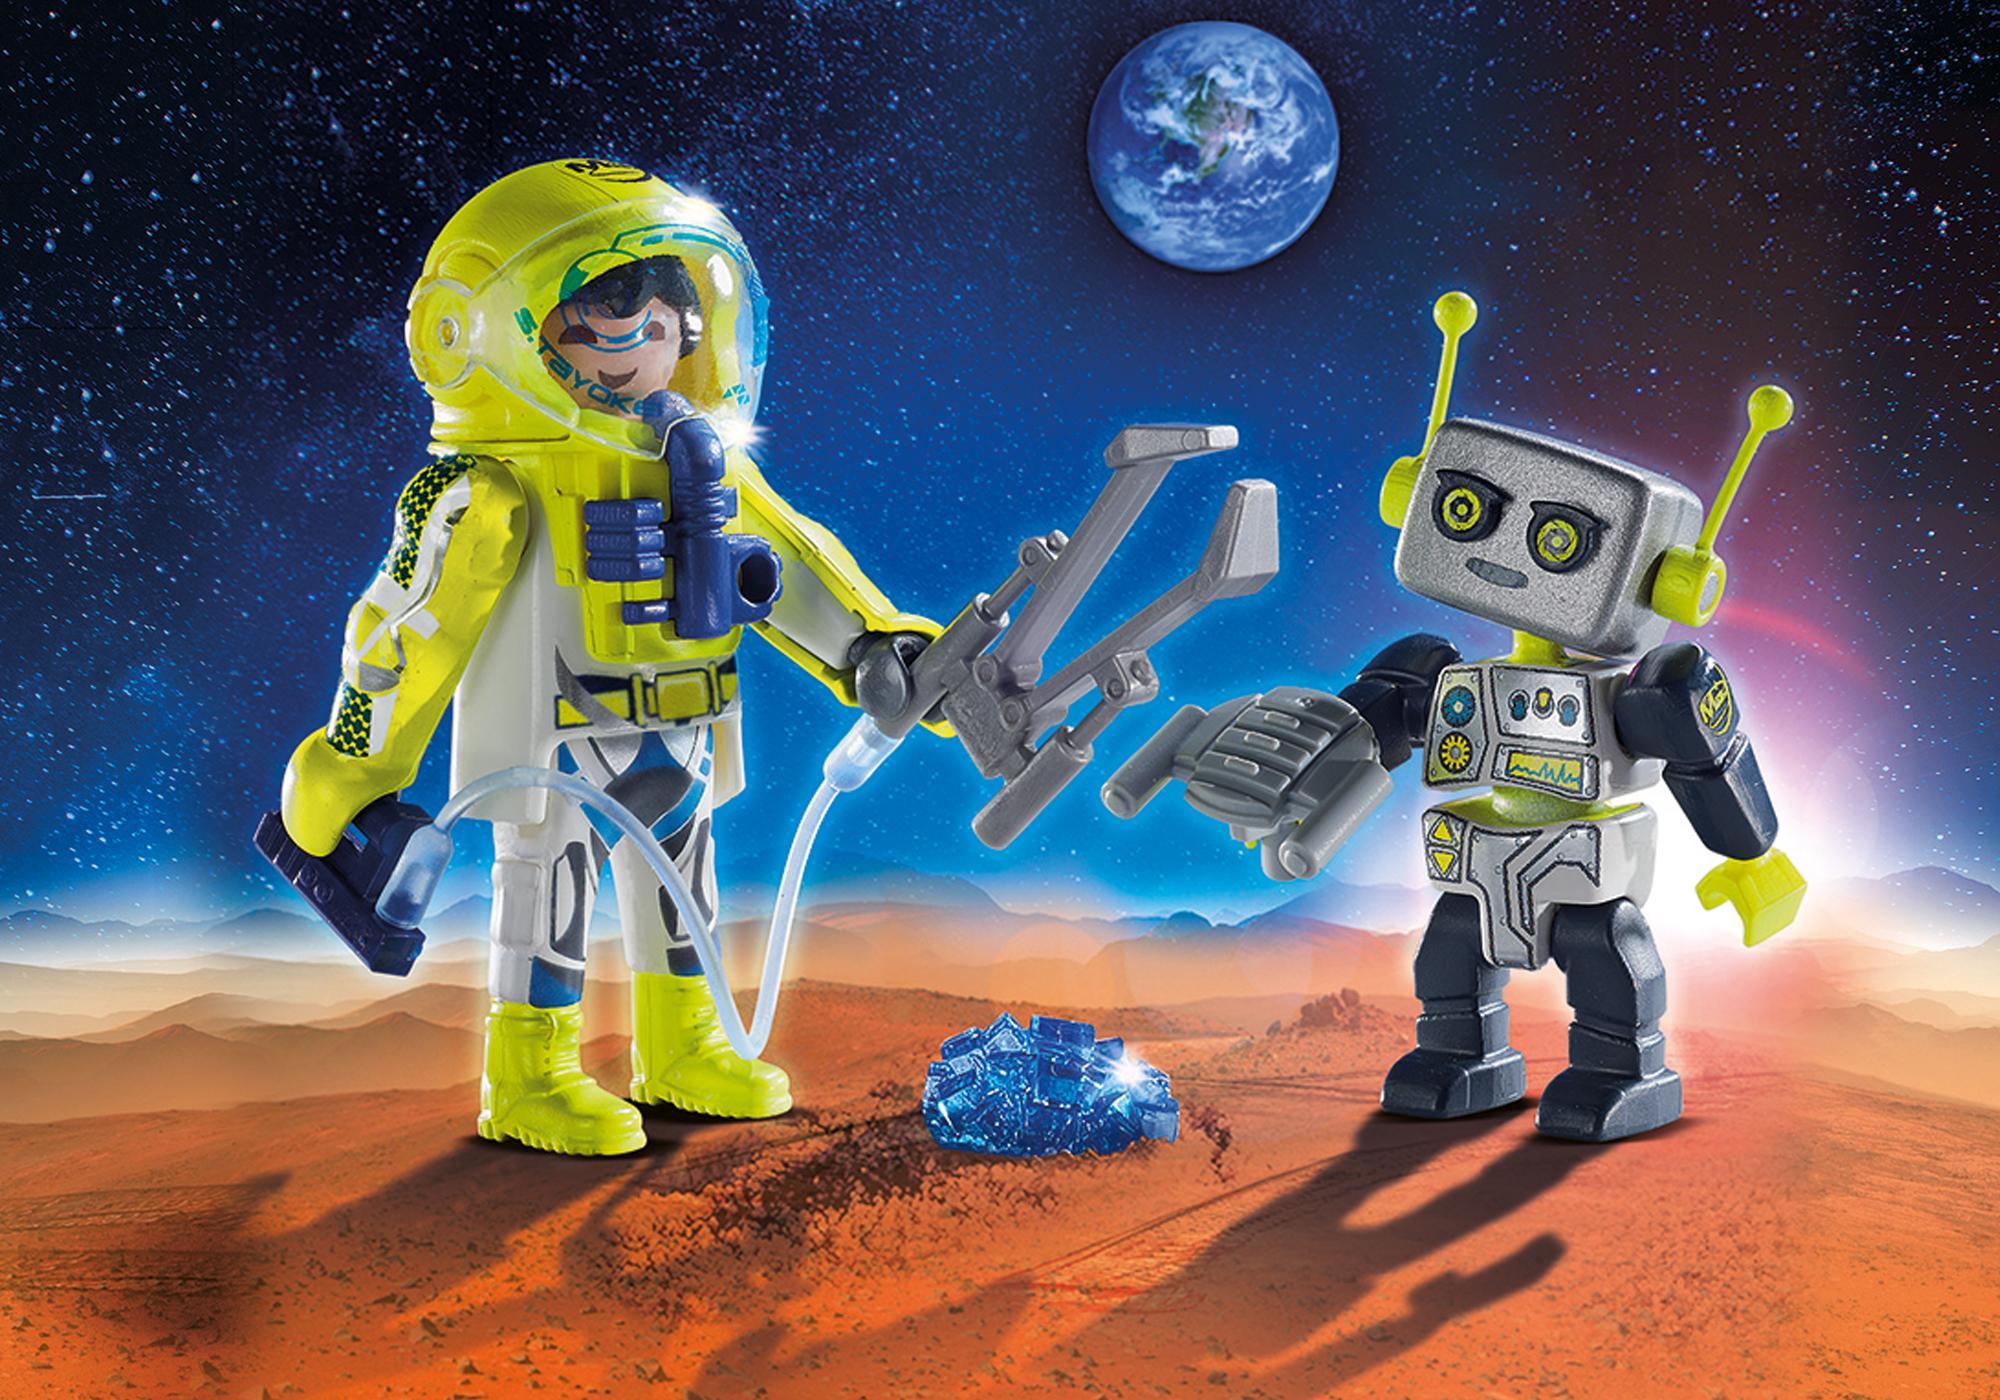 http://media.playmobil.com/i/playmobil/9492_product_detail/Duo Pack Astronauta i Robot